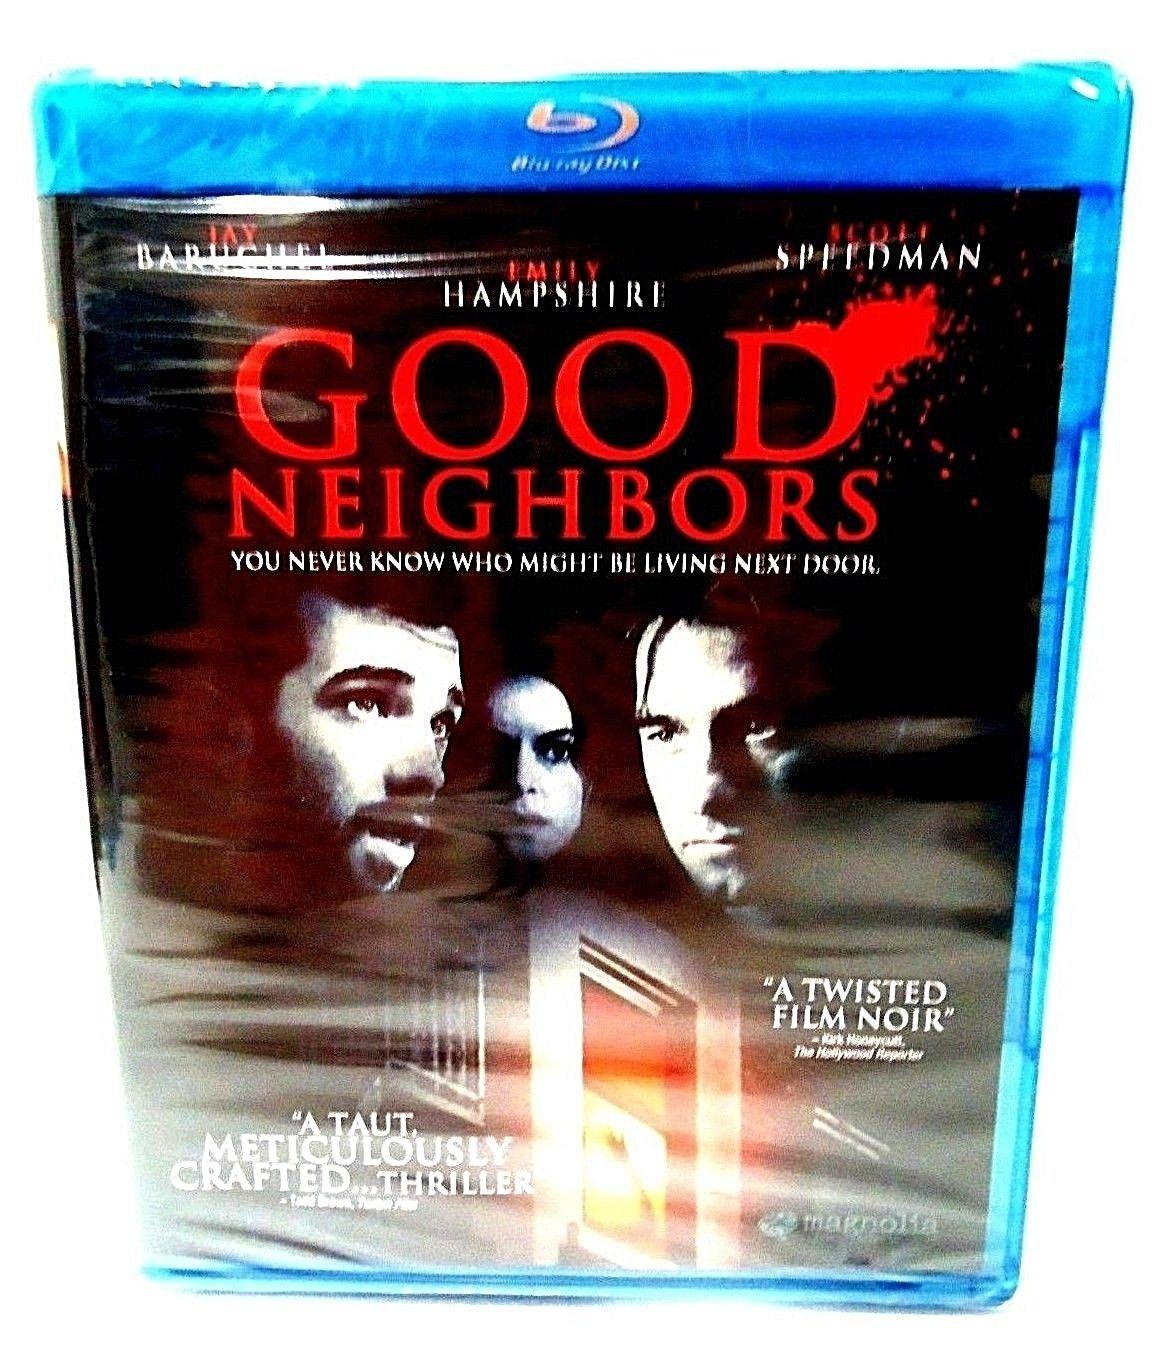 GOOD NEIGHBORS - BLU-RAY - DVD - SCOTT SPEEDMAN - NEW - CRIME - THRILLER - MOVIE